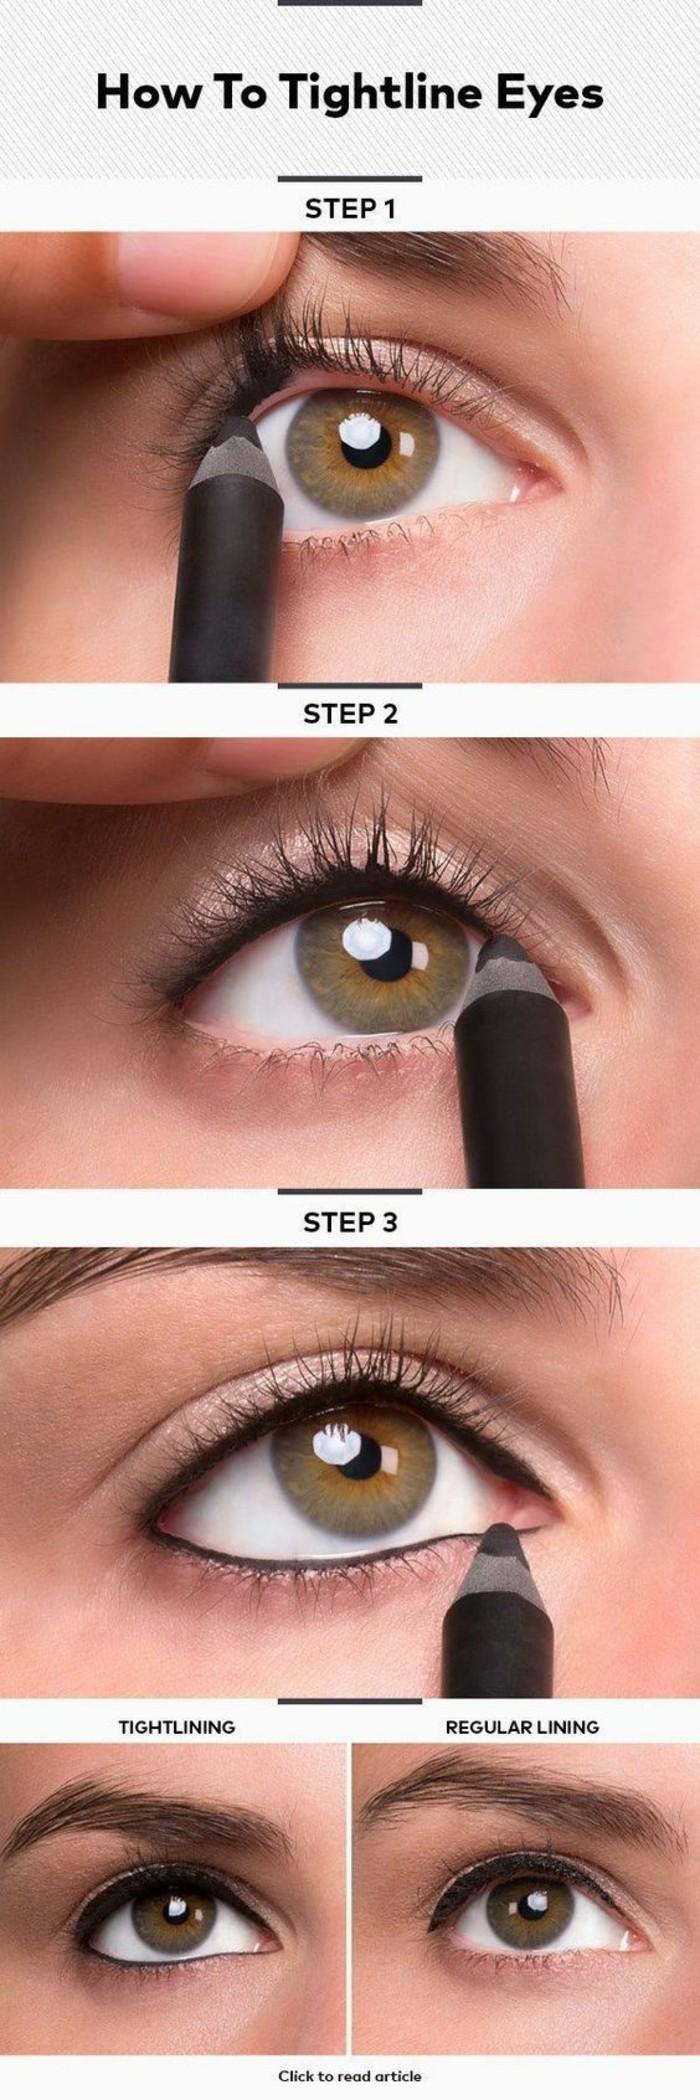 00-maquillage-année-60-maquillage-yeux-ronds-noisette-comment-se-maquiller